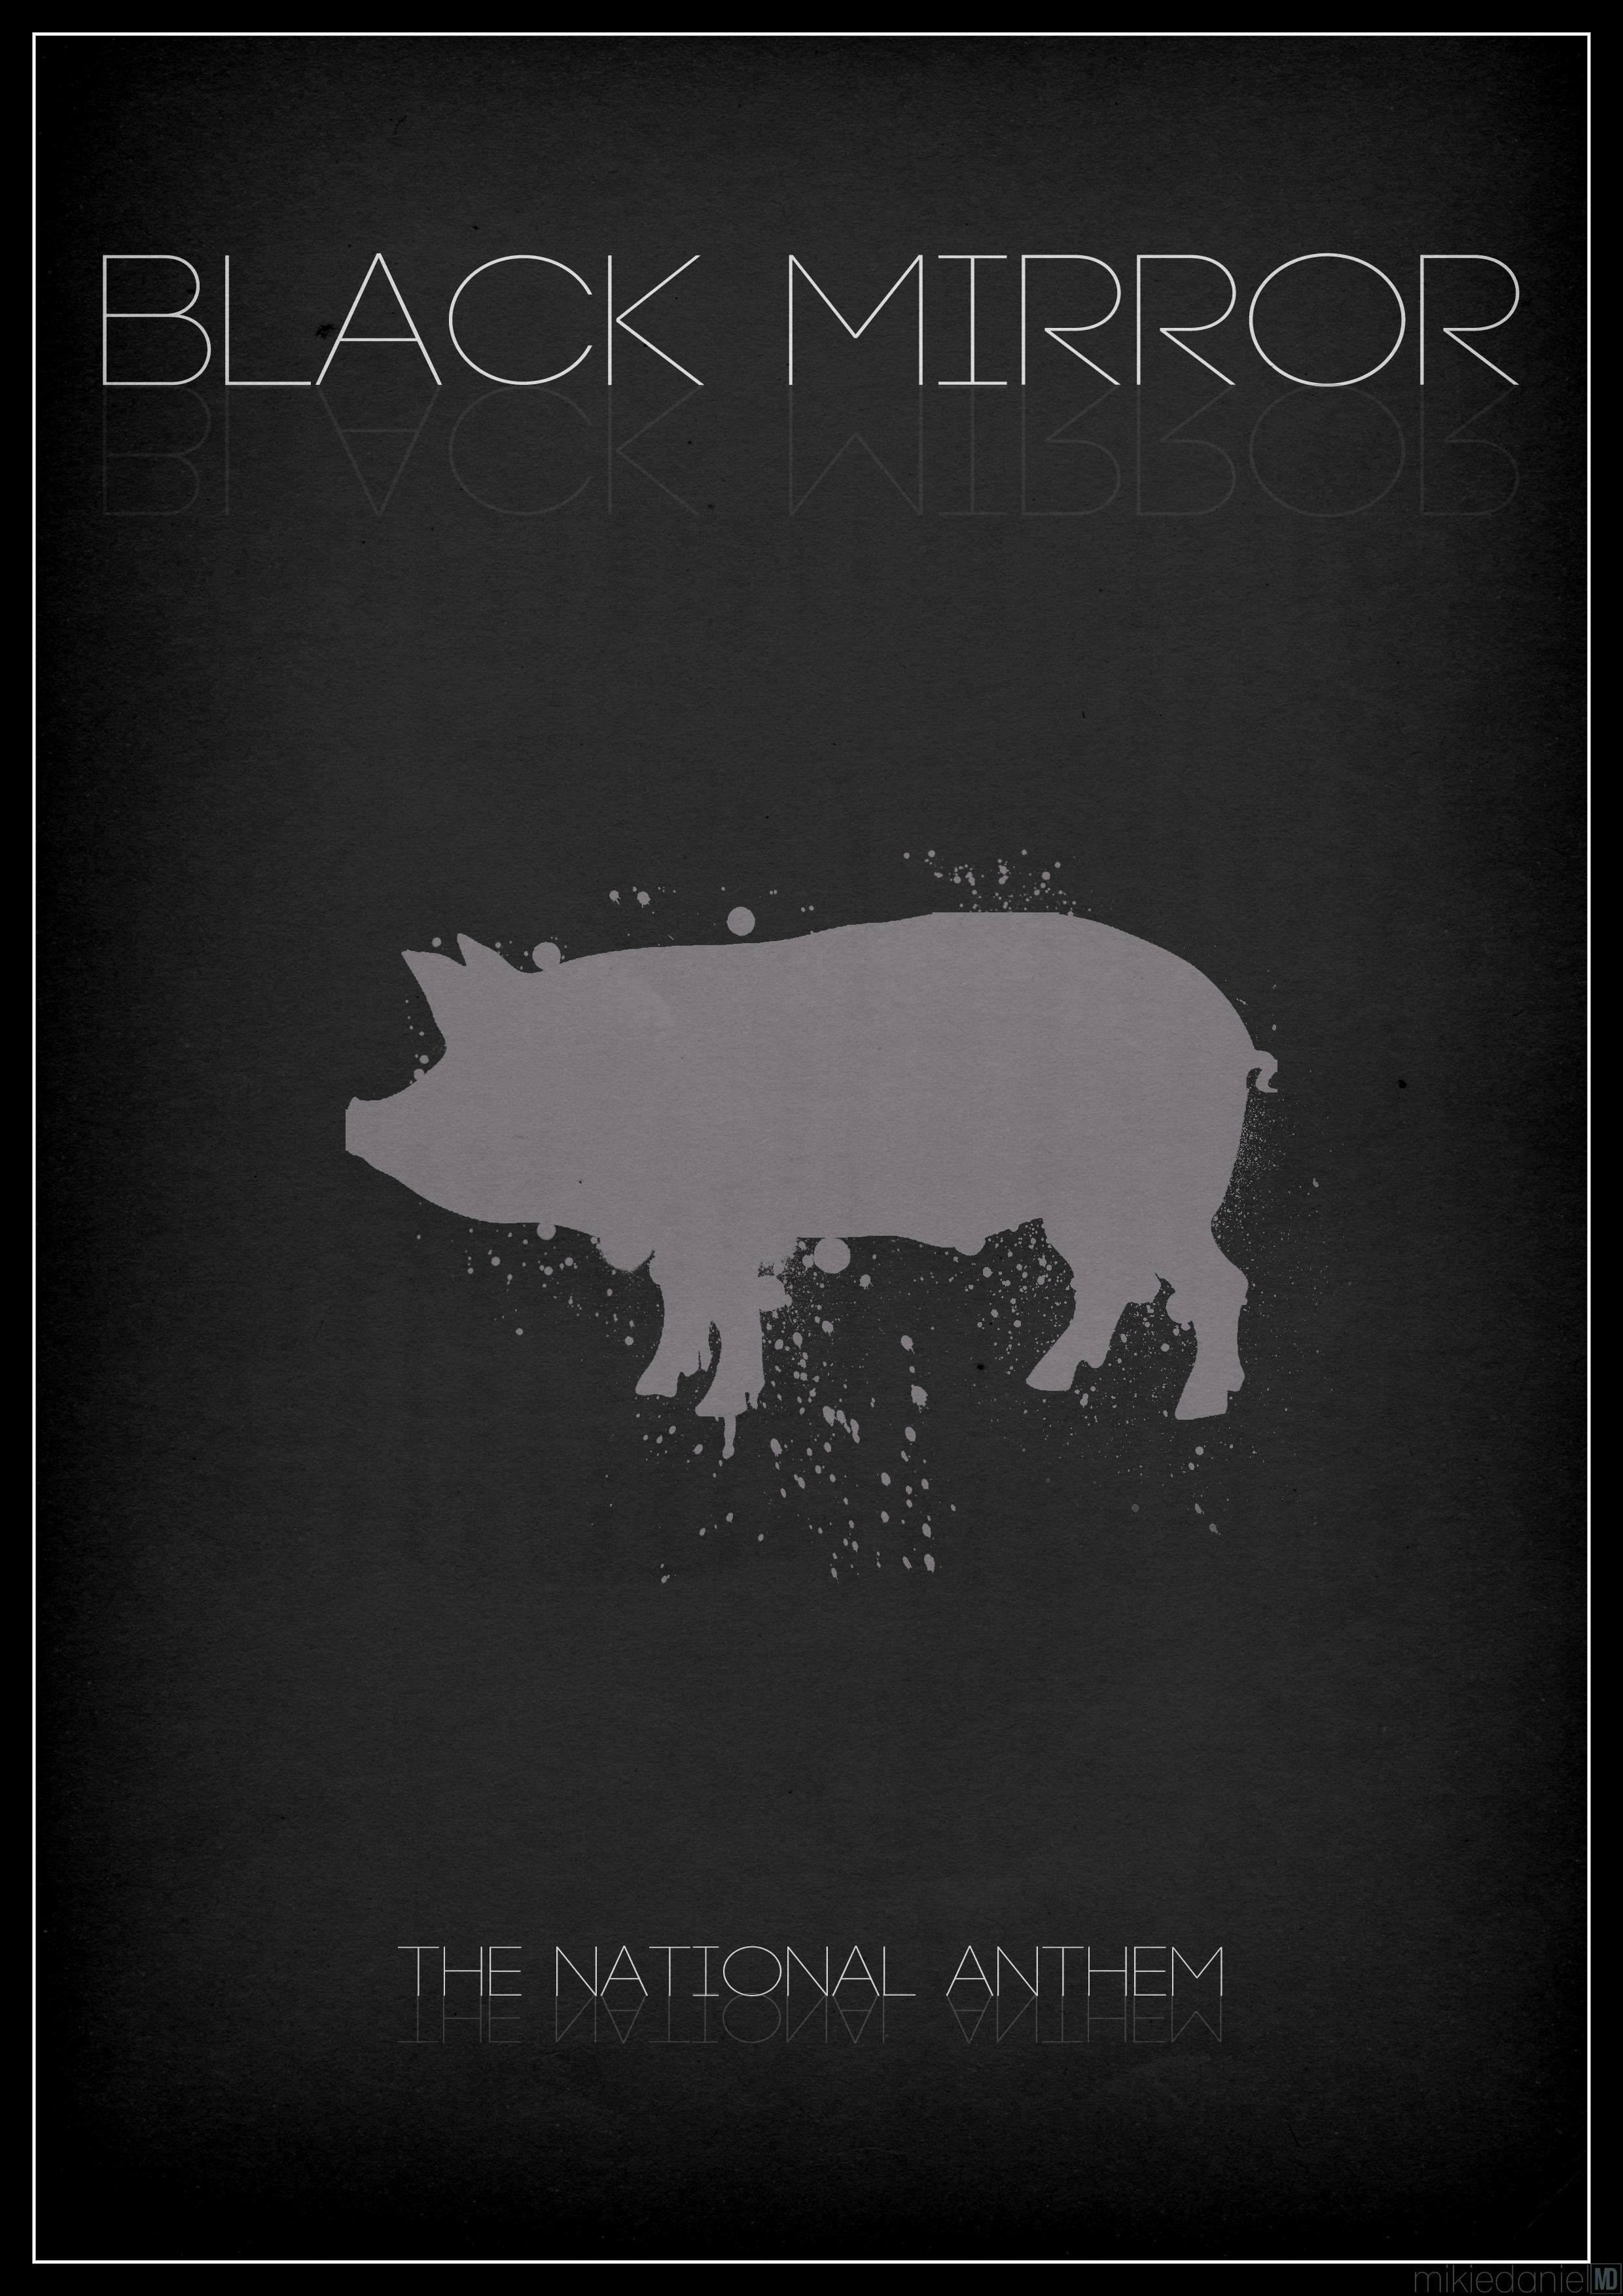 Black Mirror Pig Black Mirror Poster Set